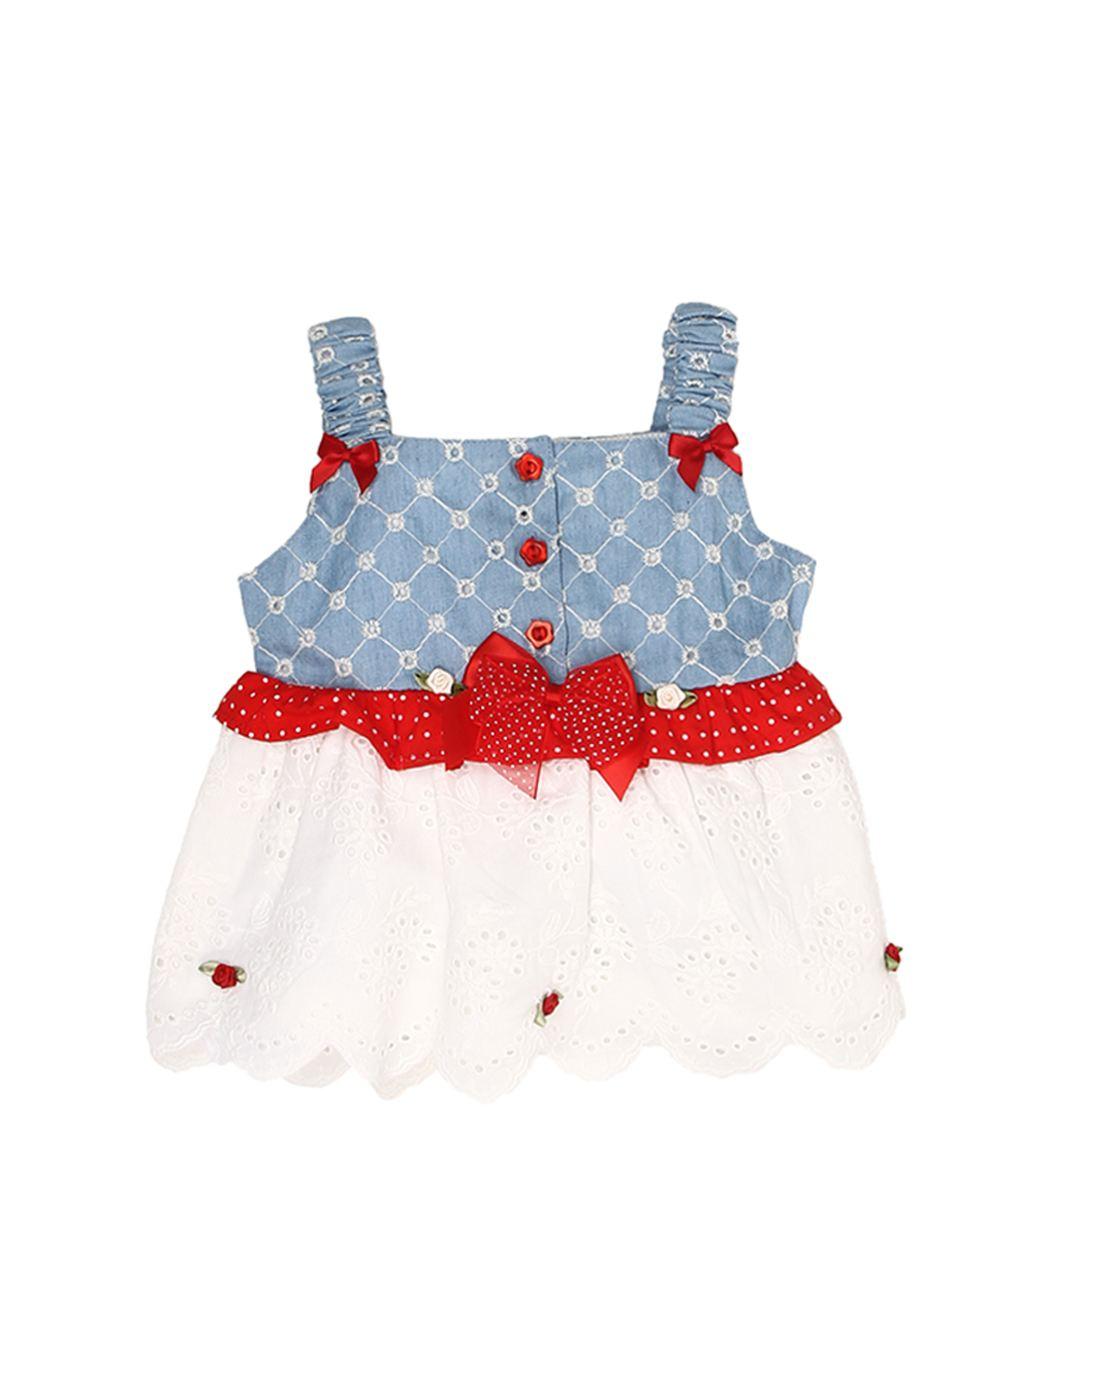 K.C.O 89 Baby Girls Party Printed Sleeveless Dress